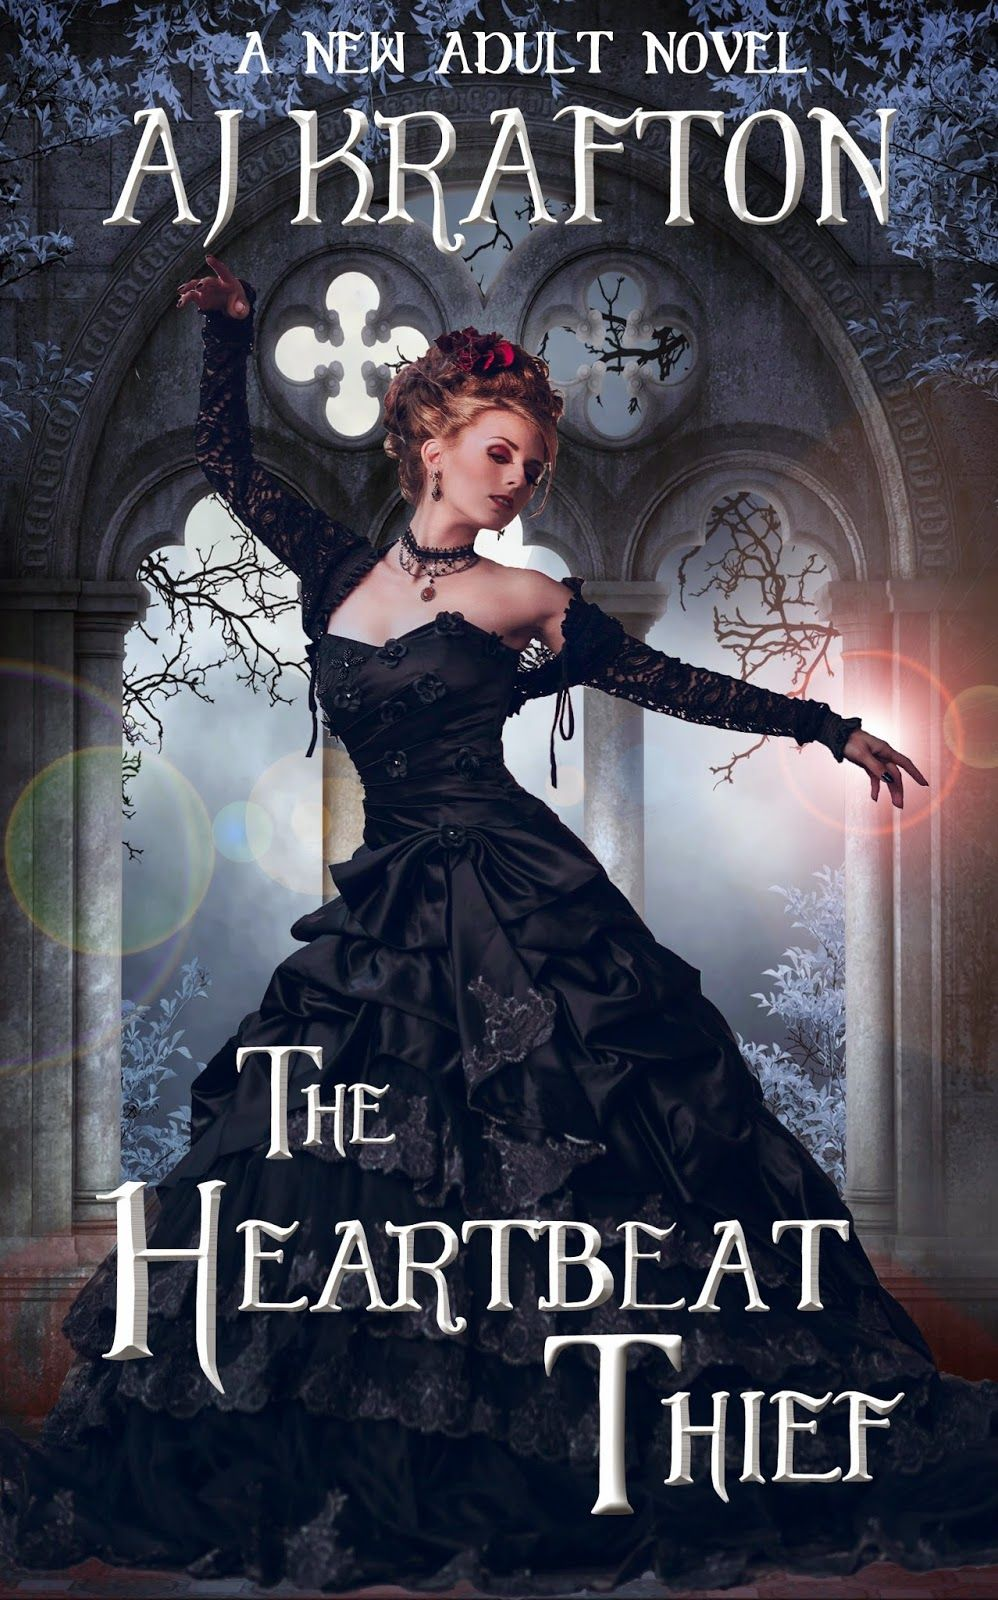 AJ Krafton - The Heartbeat Thief